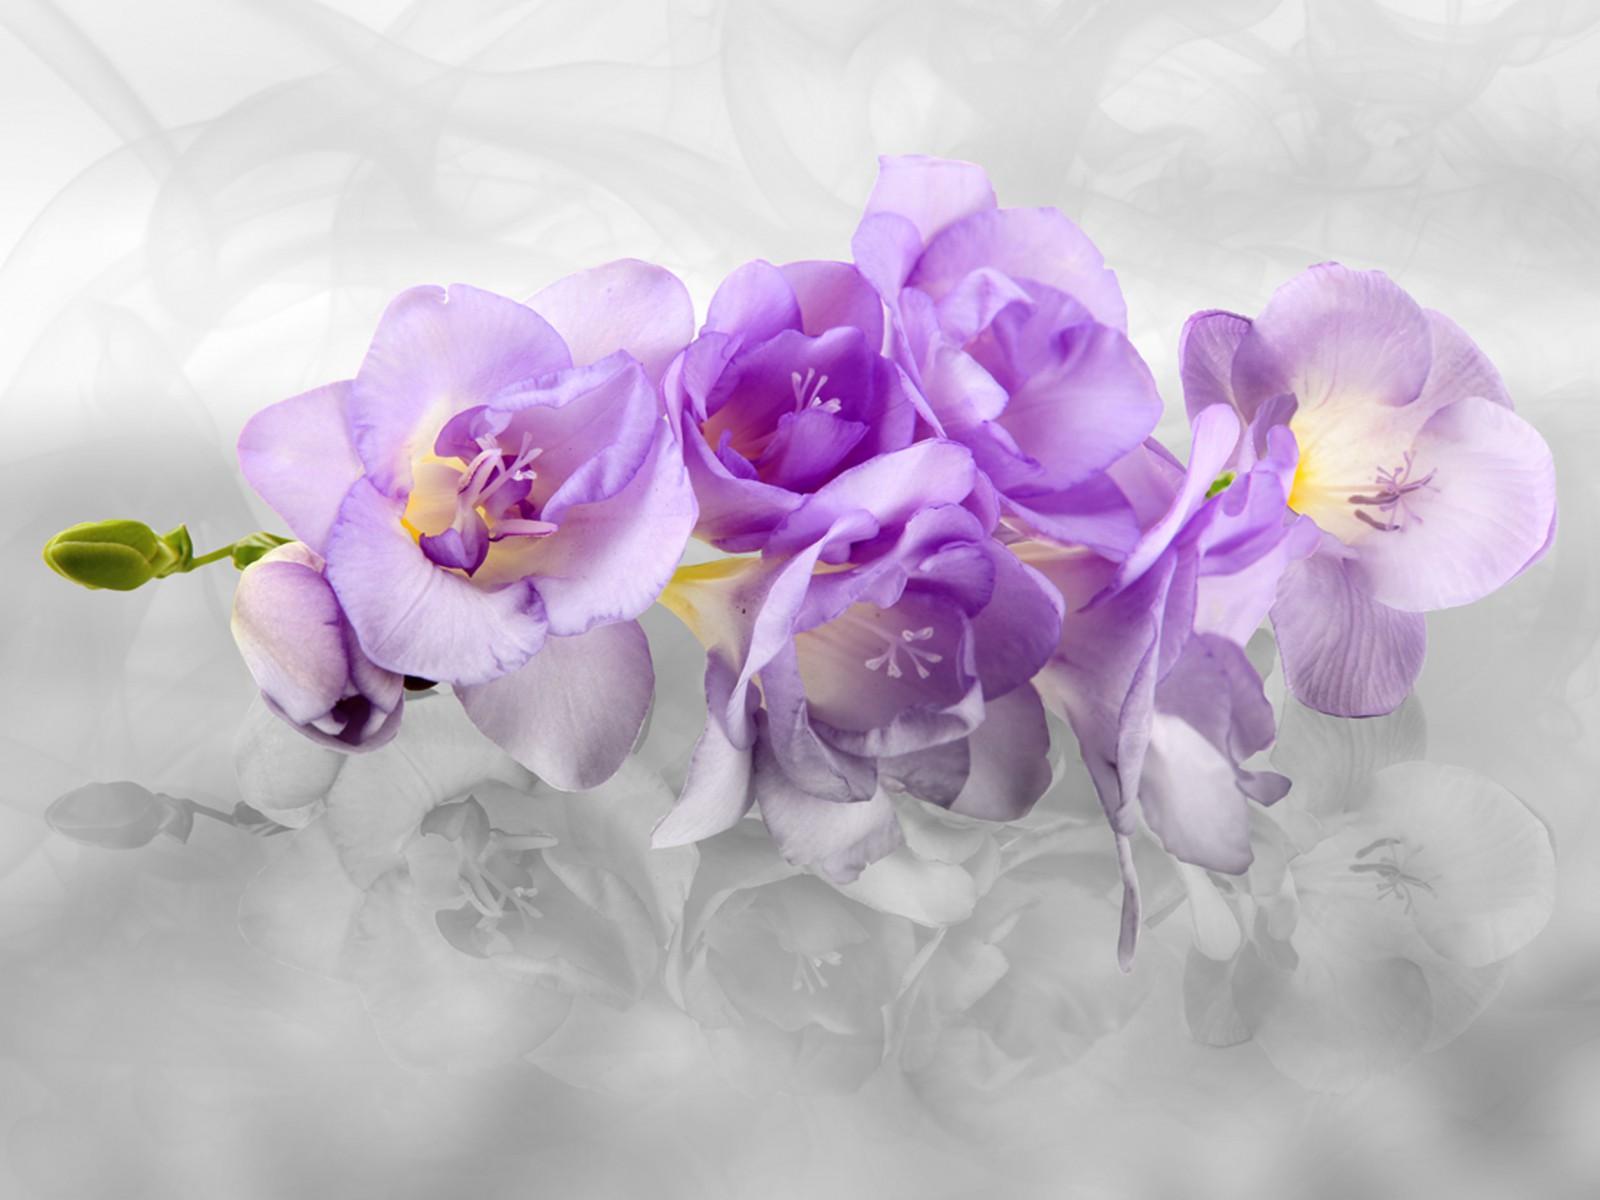 xxl fototapeten tapete orchideen blumen bl te 3d. Black Bedroom Furniture Sets. Home Design Ideas